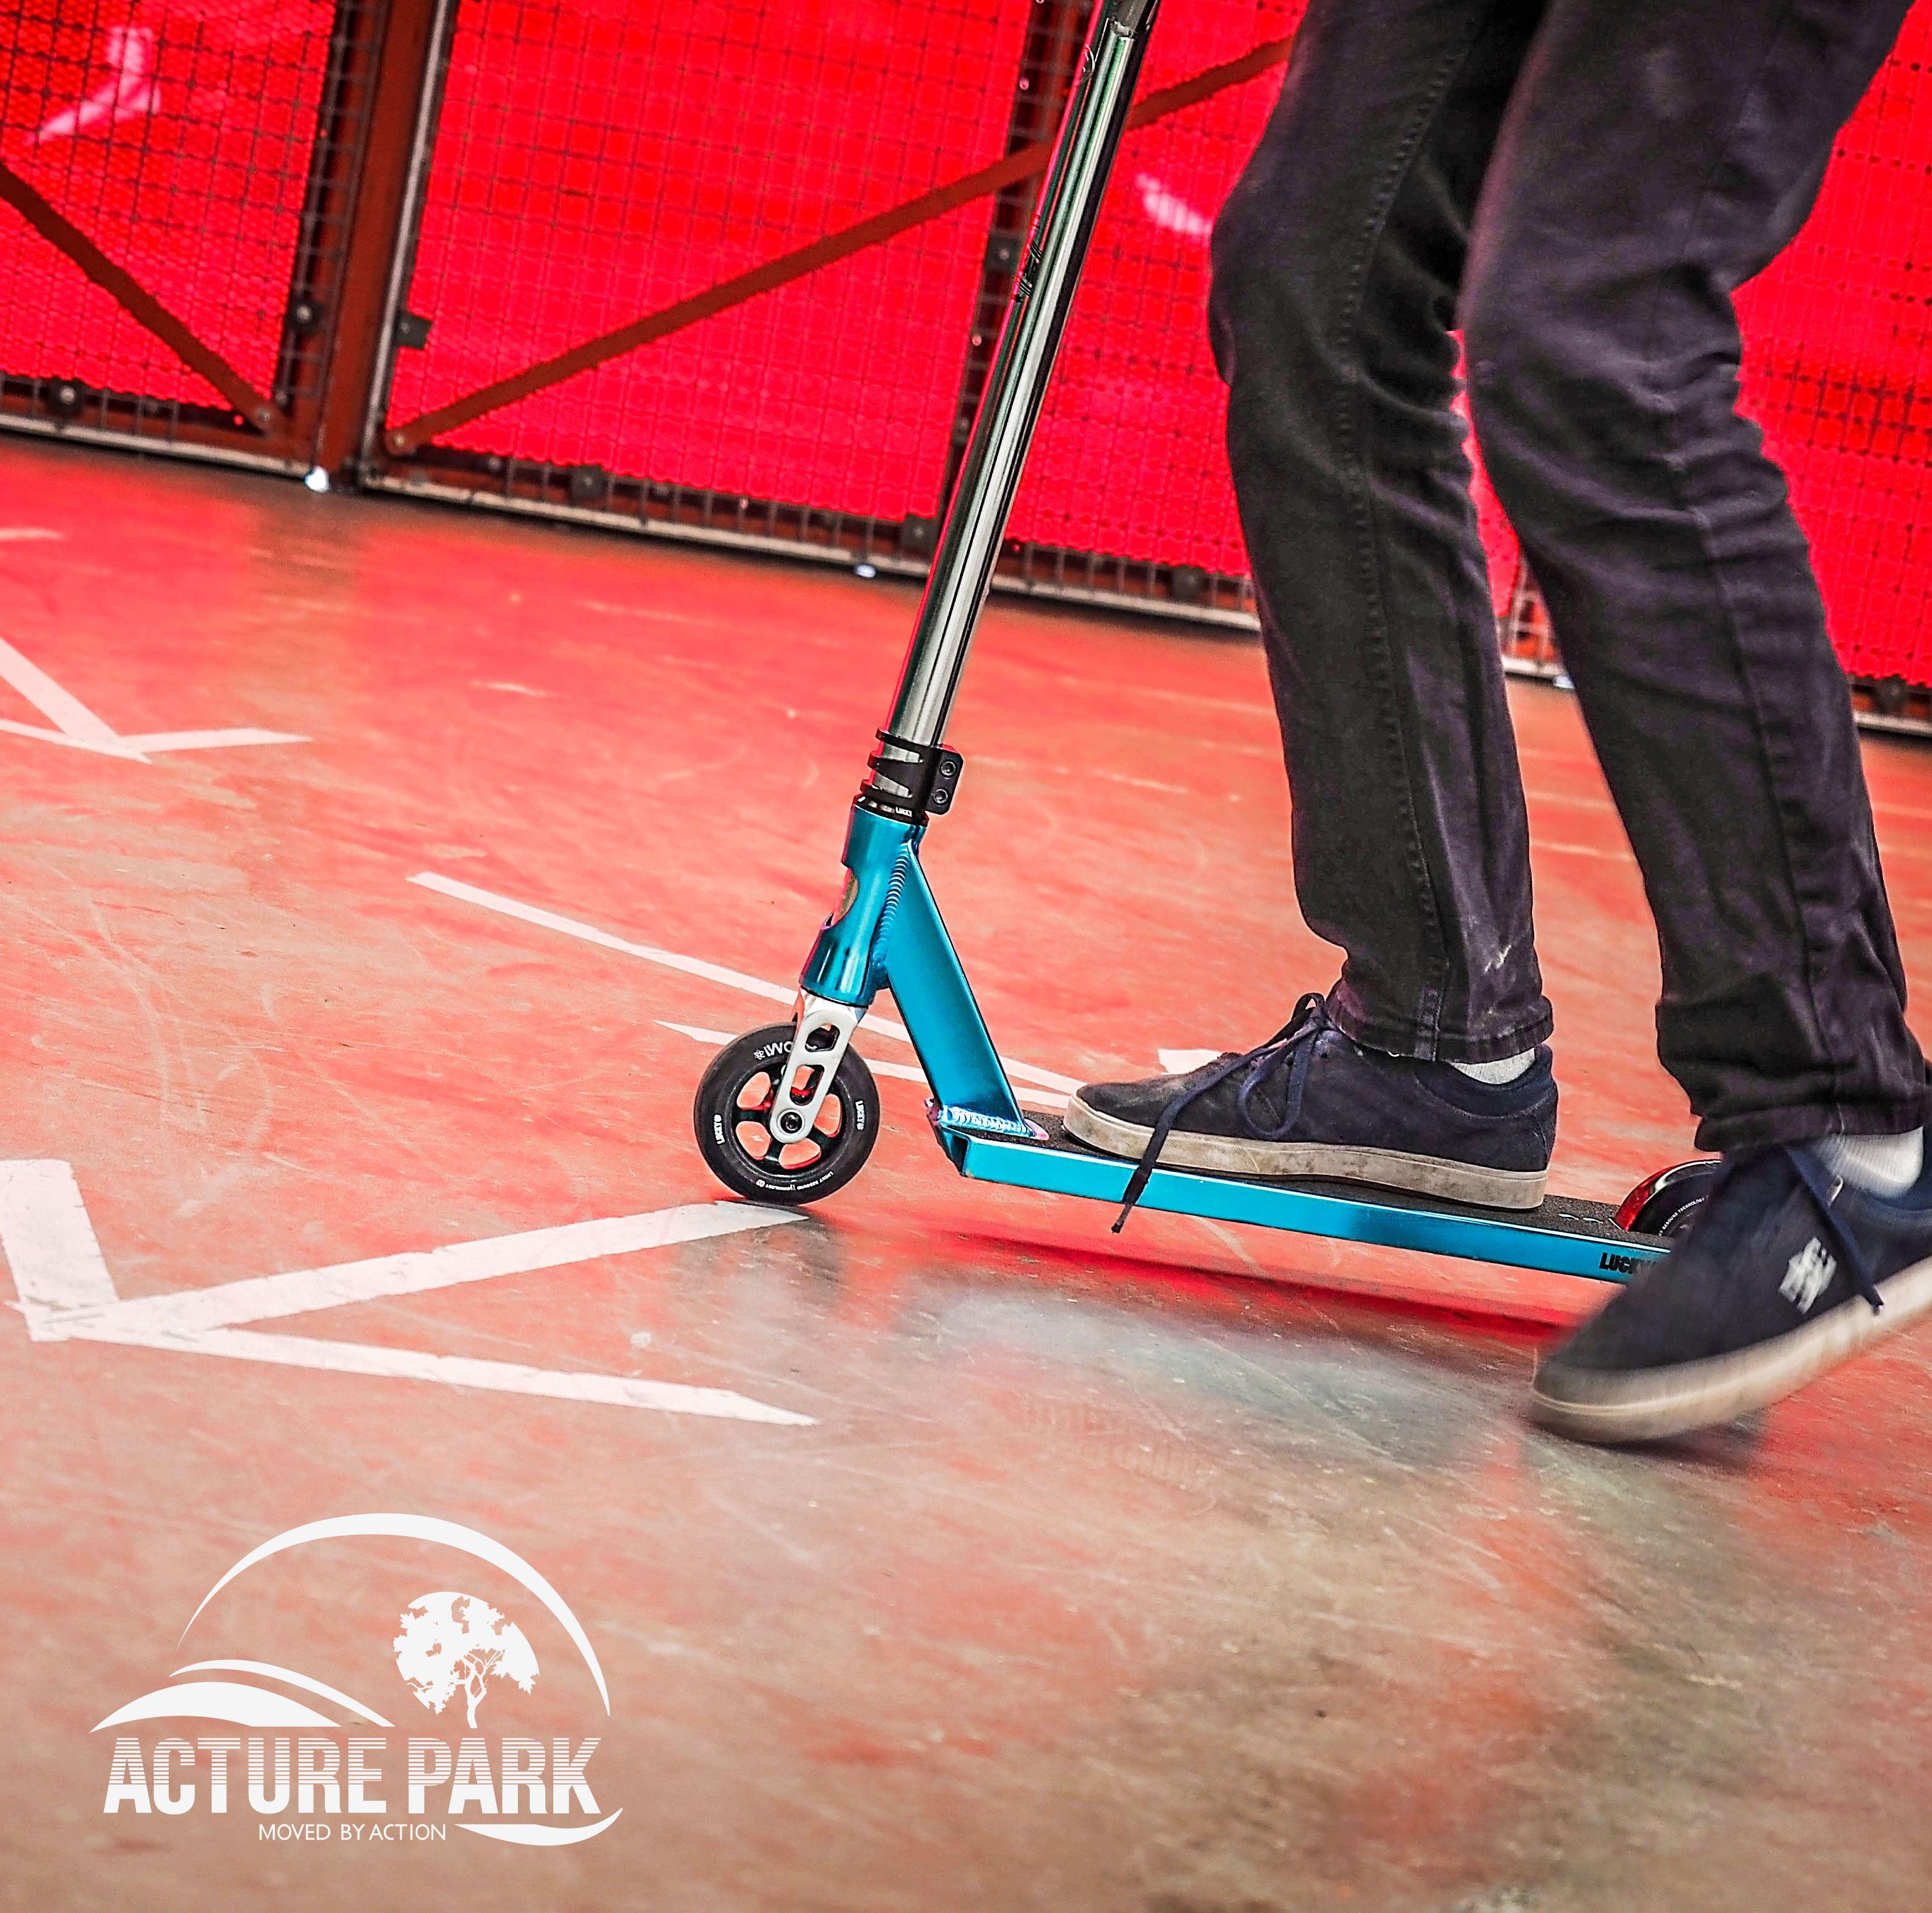 FUNCARD Løbehjulsskole - for nybegyndere i alle aldre